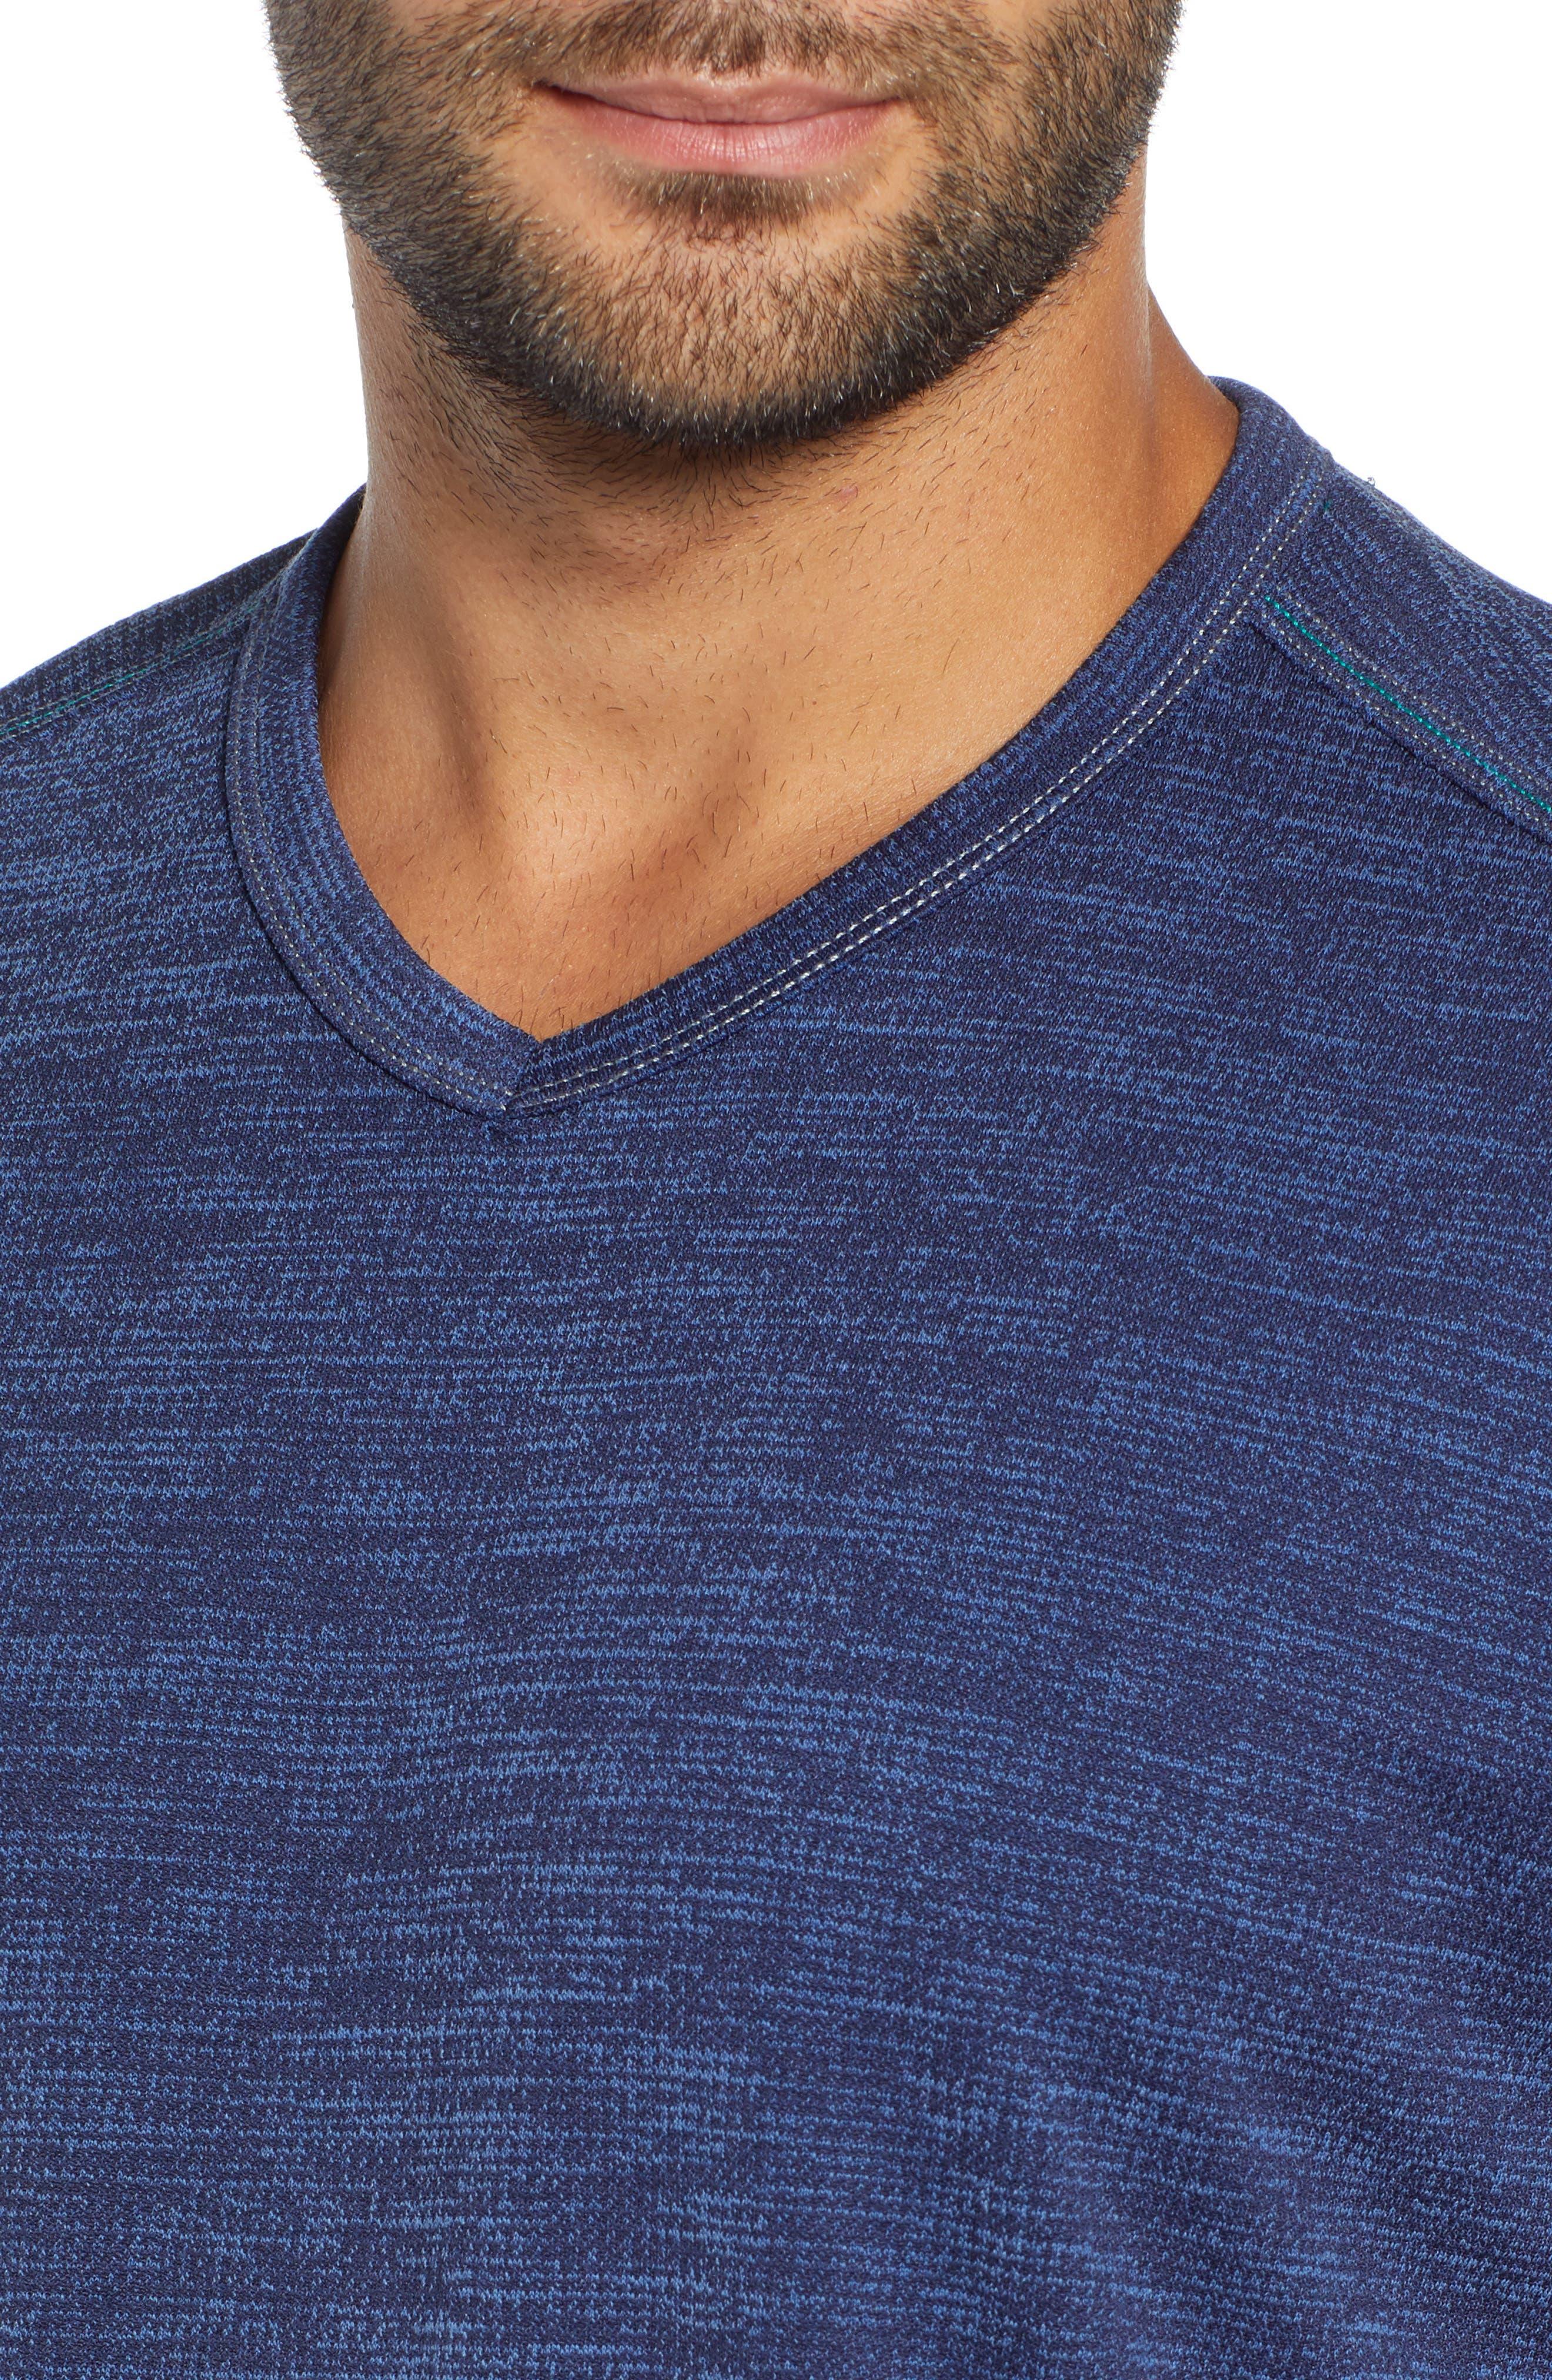 Sand Key V-Neck T-Shirt,                             Alternate thumbnail 30, color,